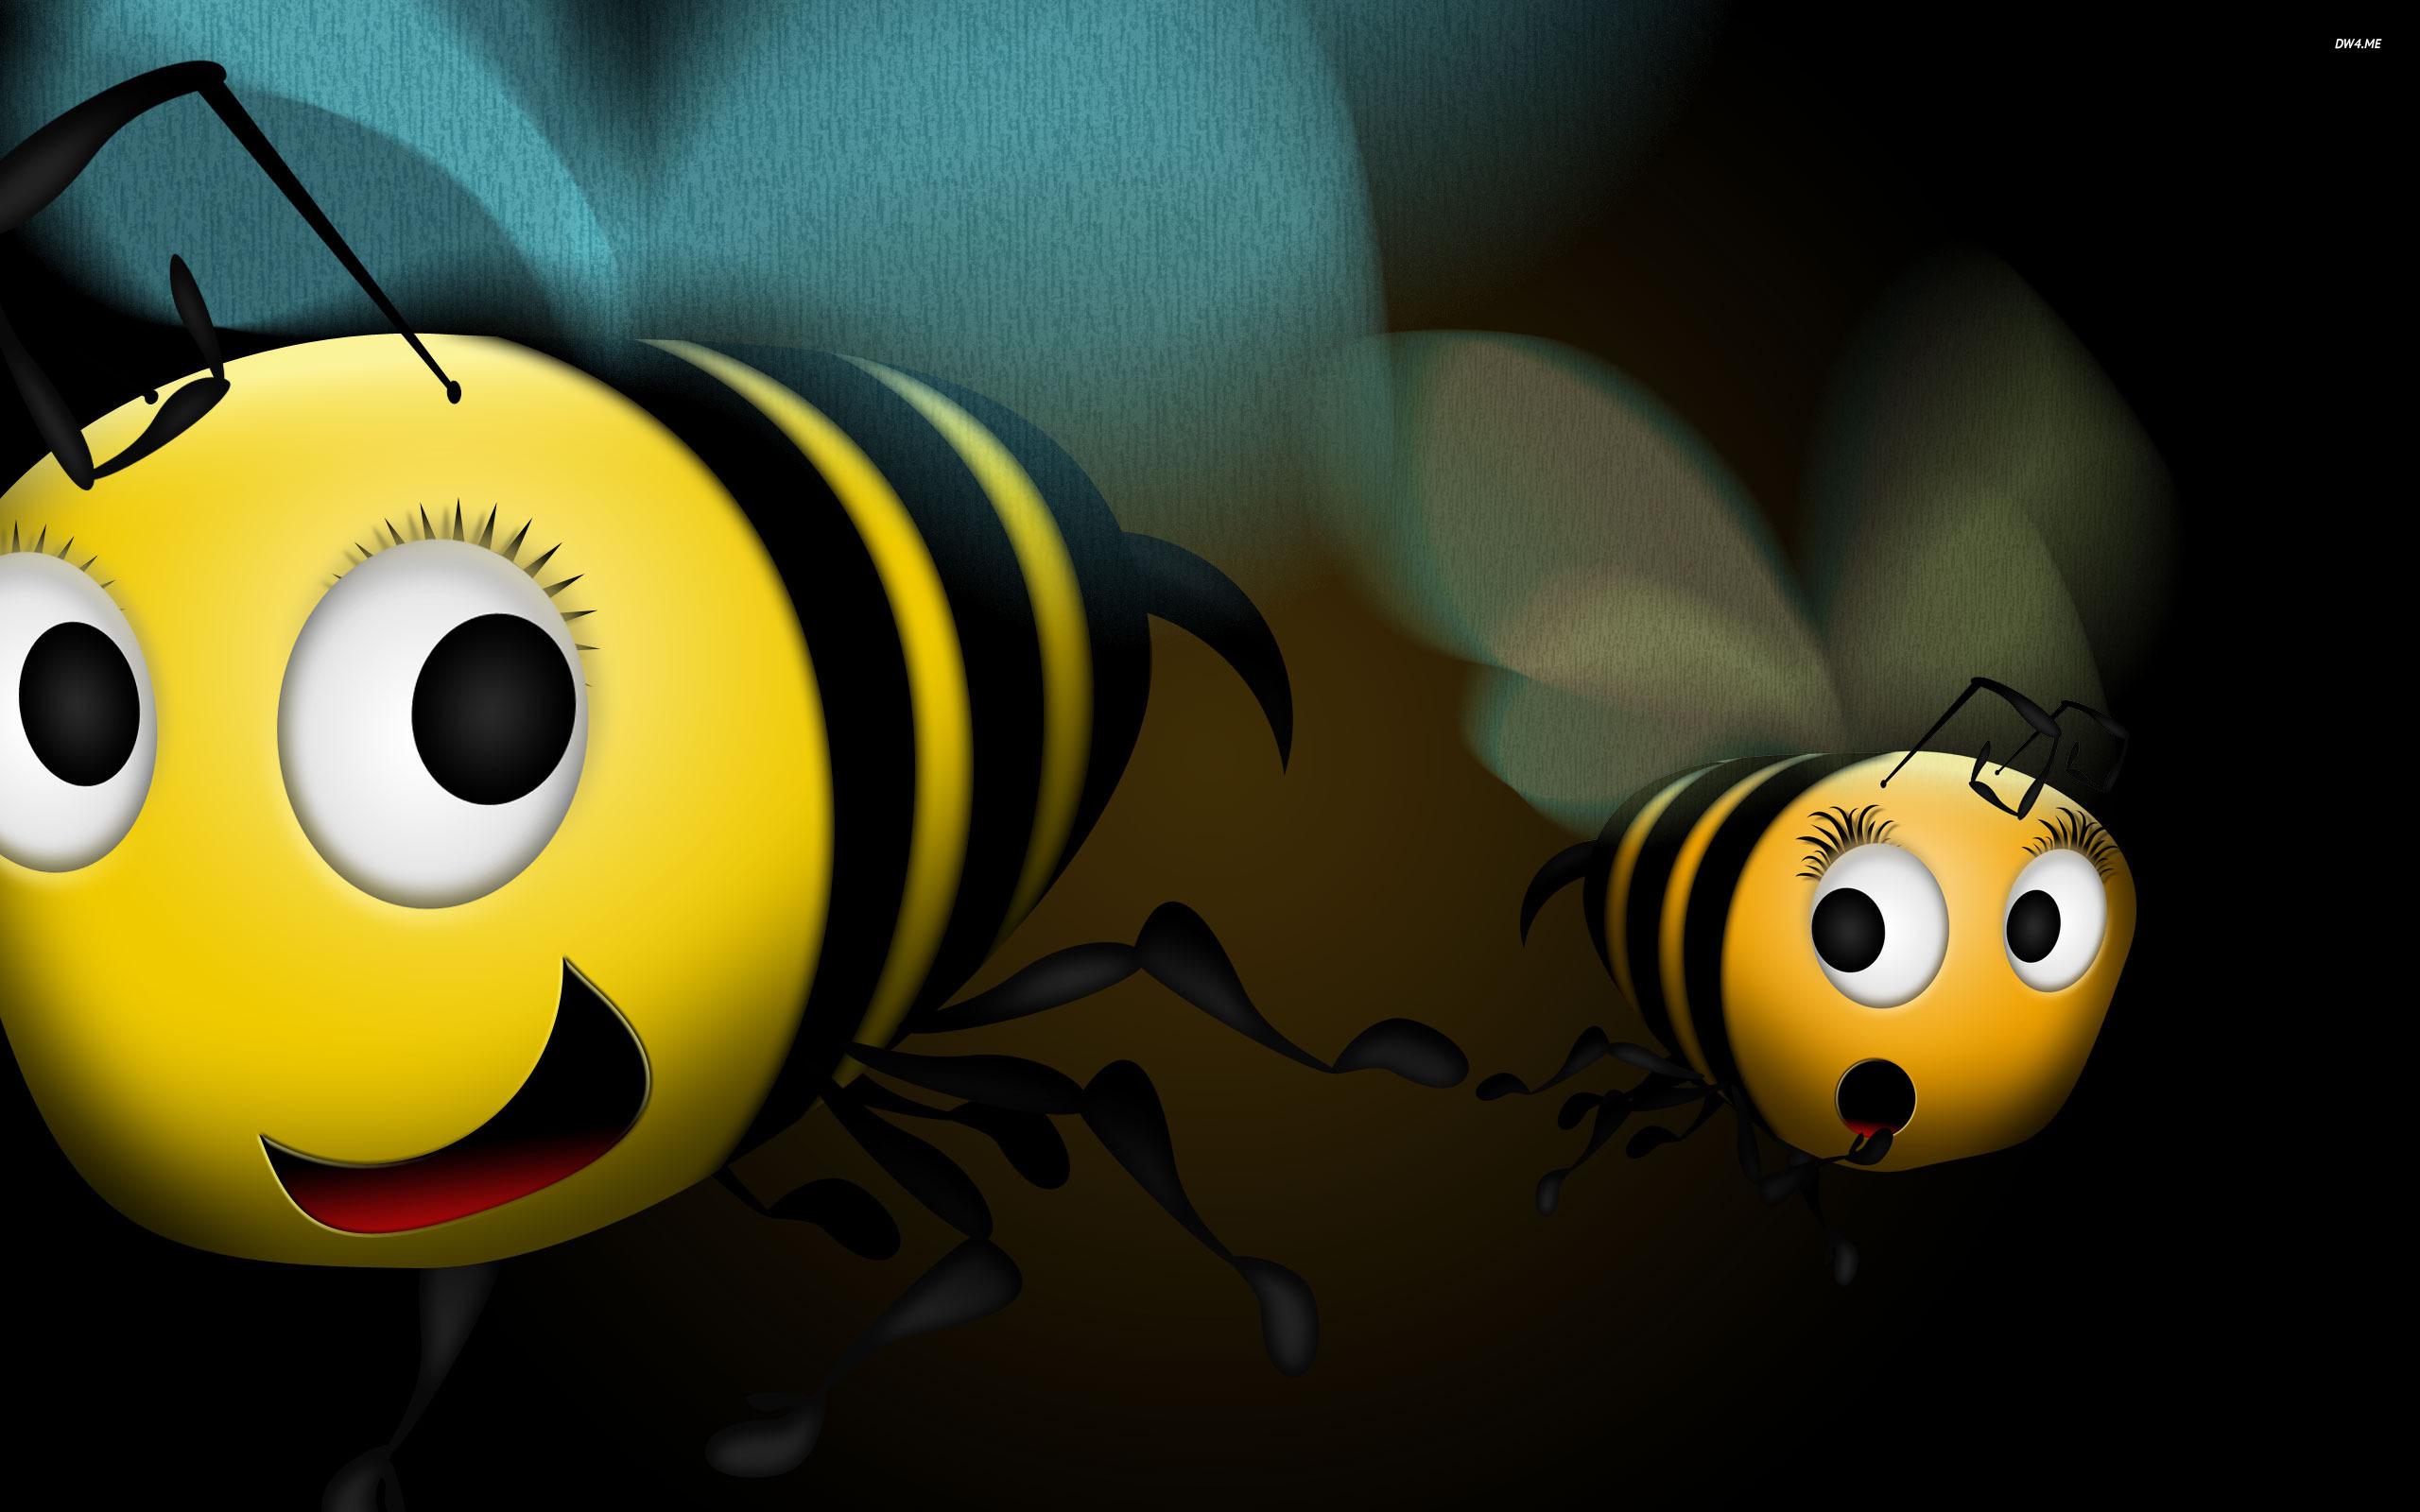 Honey bees wallpaper   Digital Art wallpapers   531 2560x1600